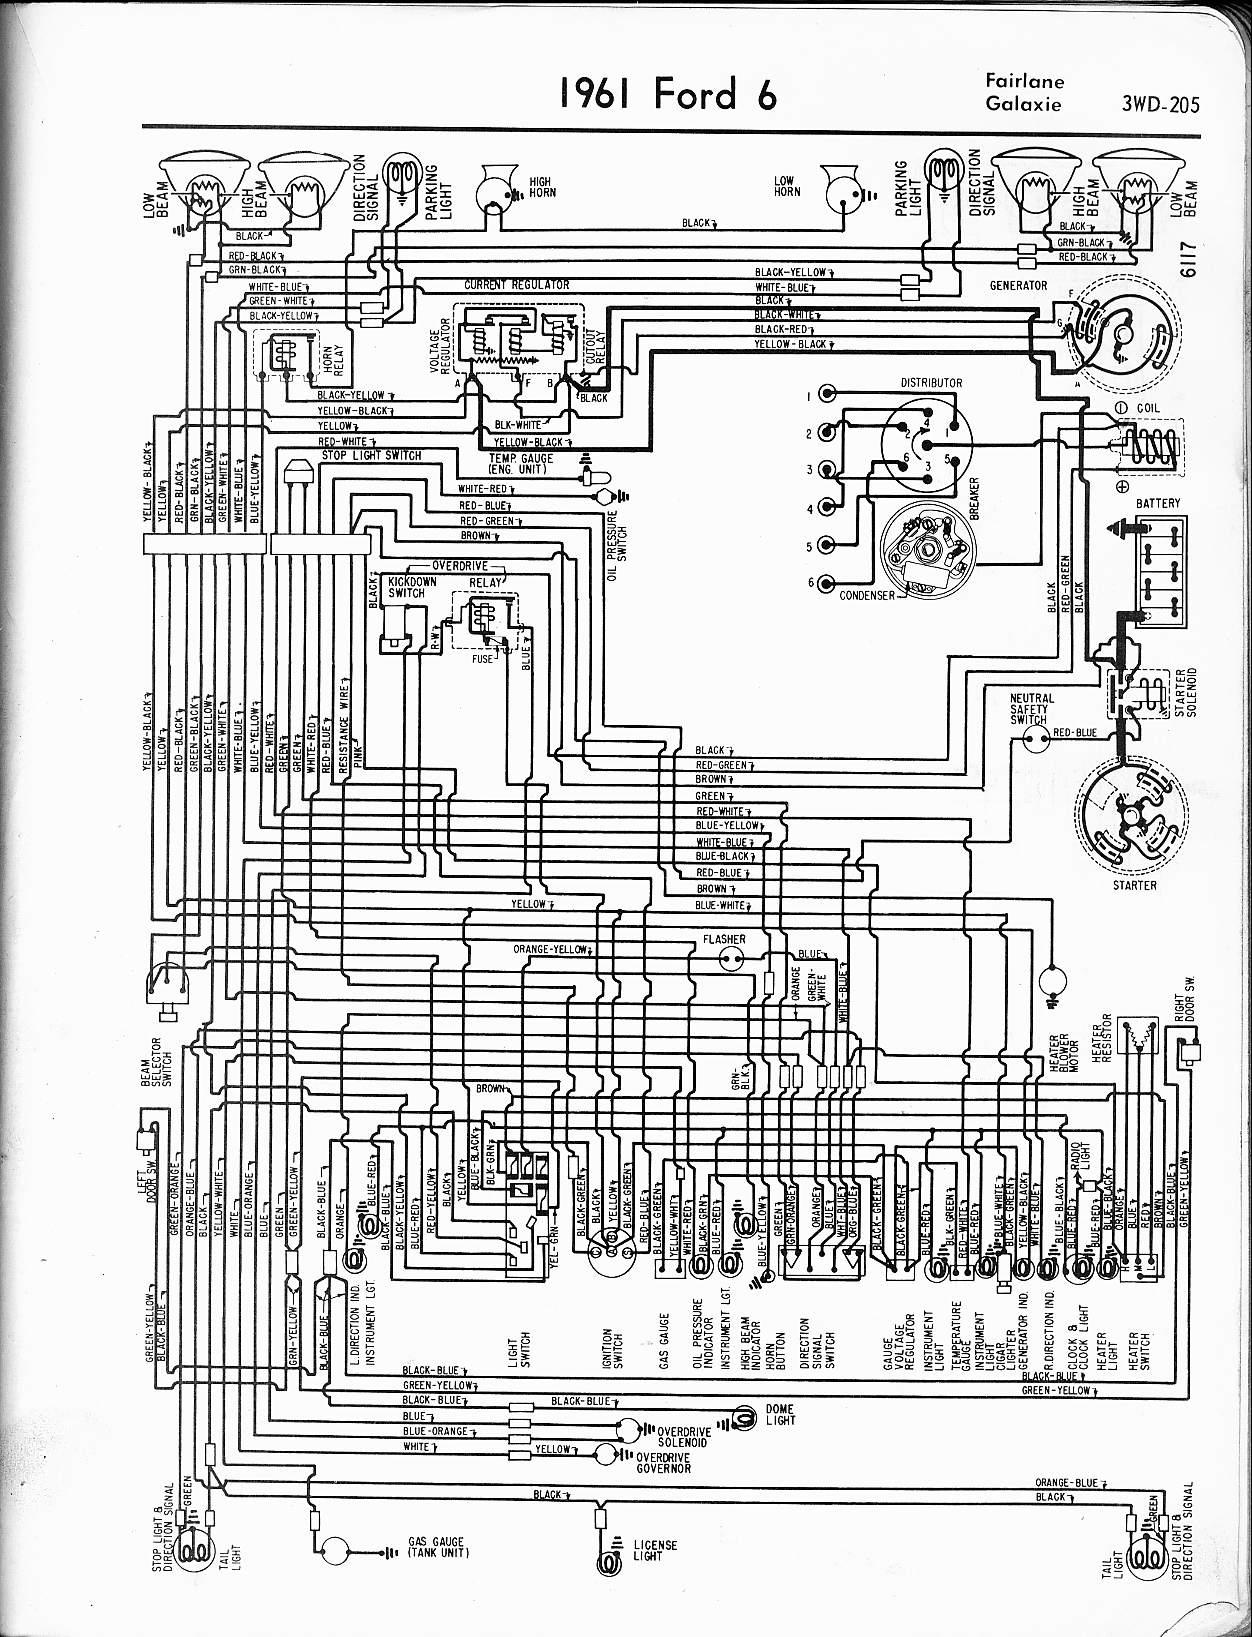 Ford Falcon Ignition Wiring Diagram Auto Electrical Au Ute Car Switch Ranchero Xg